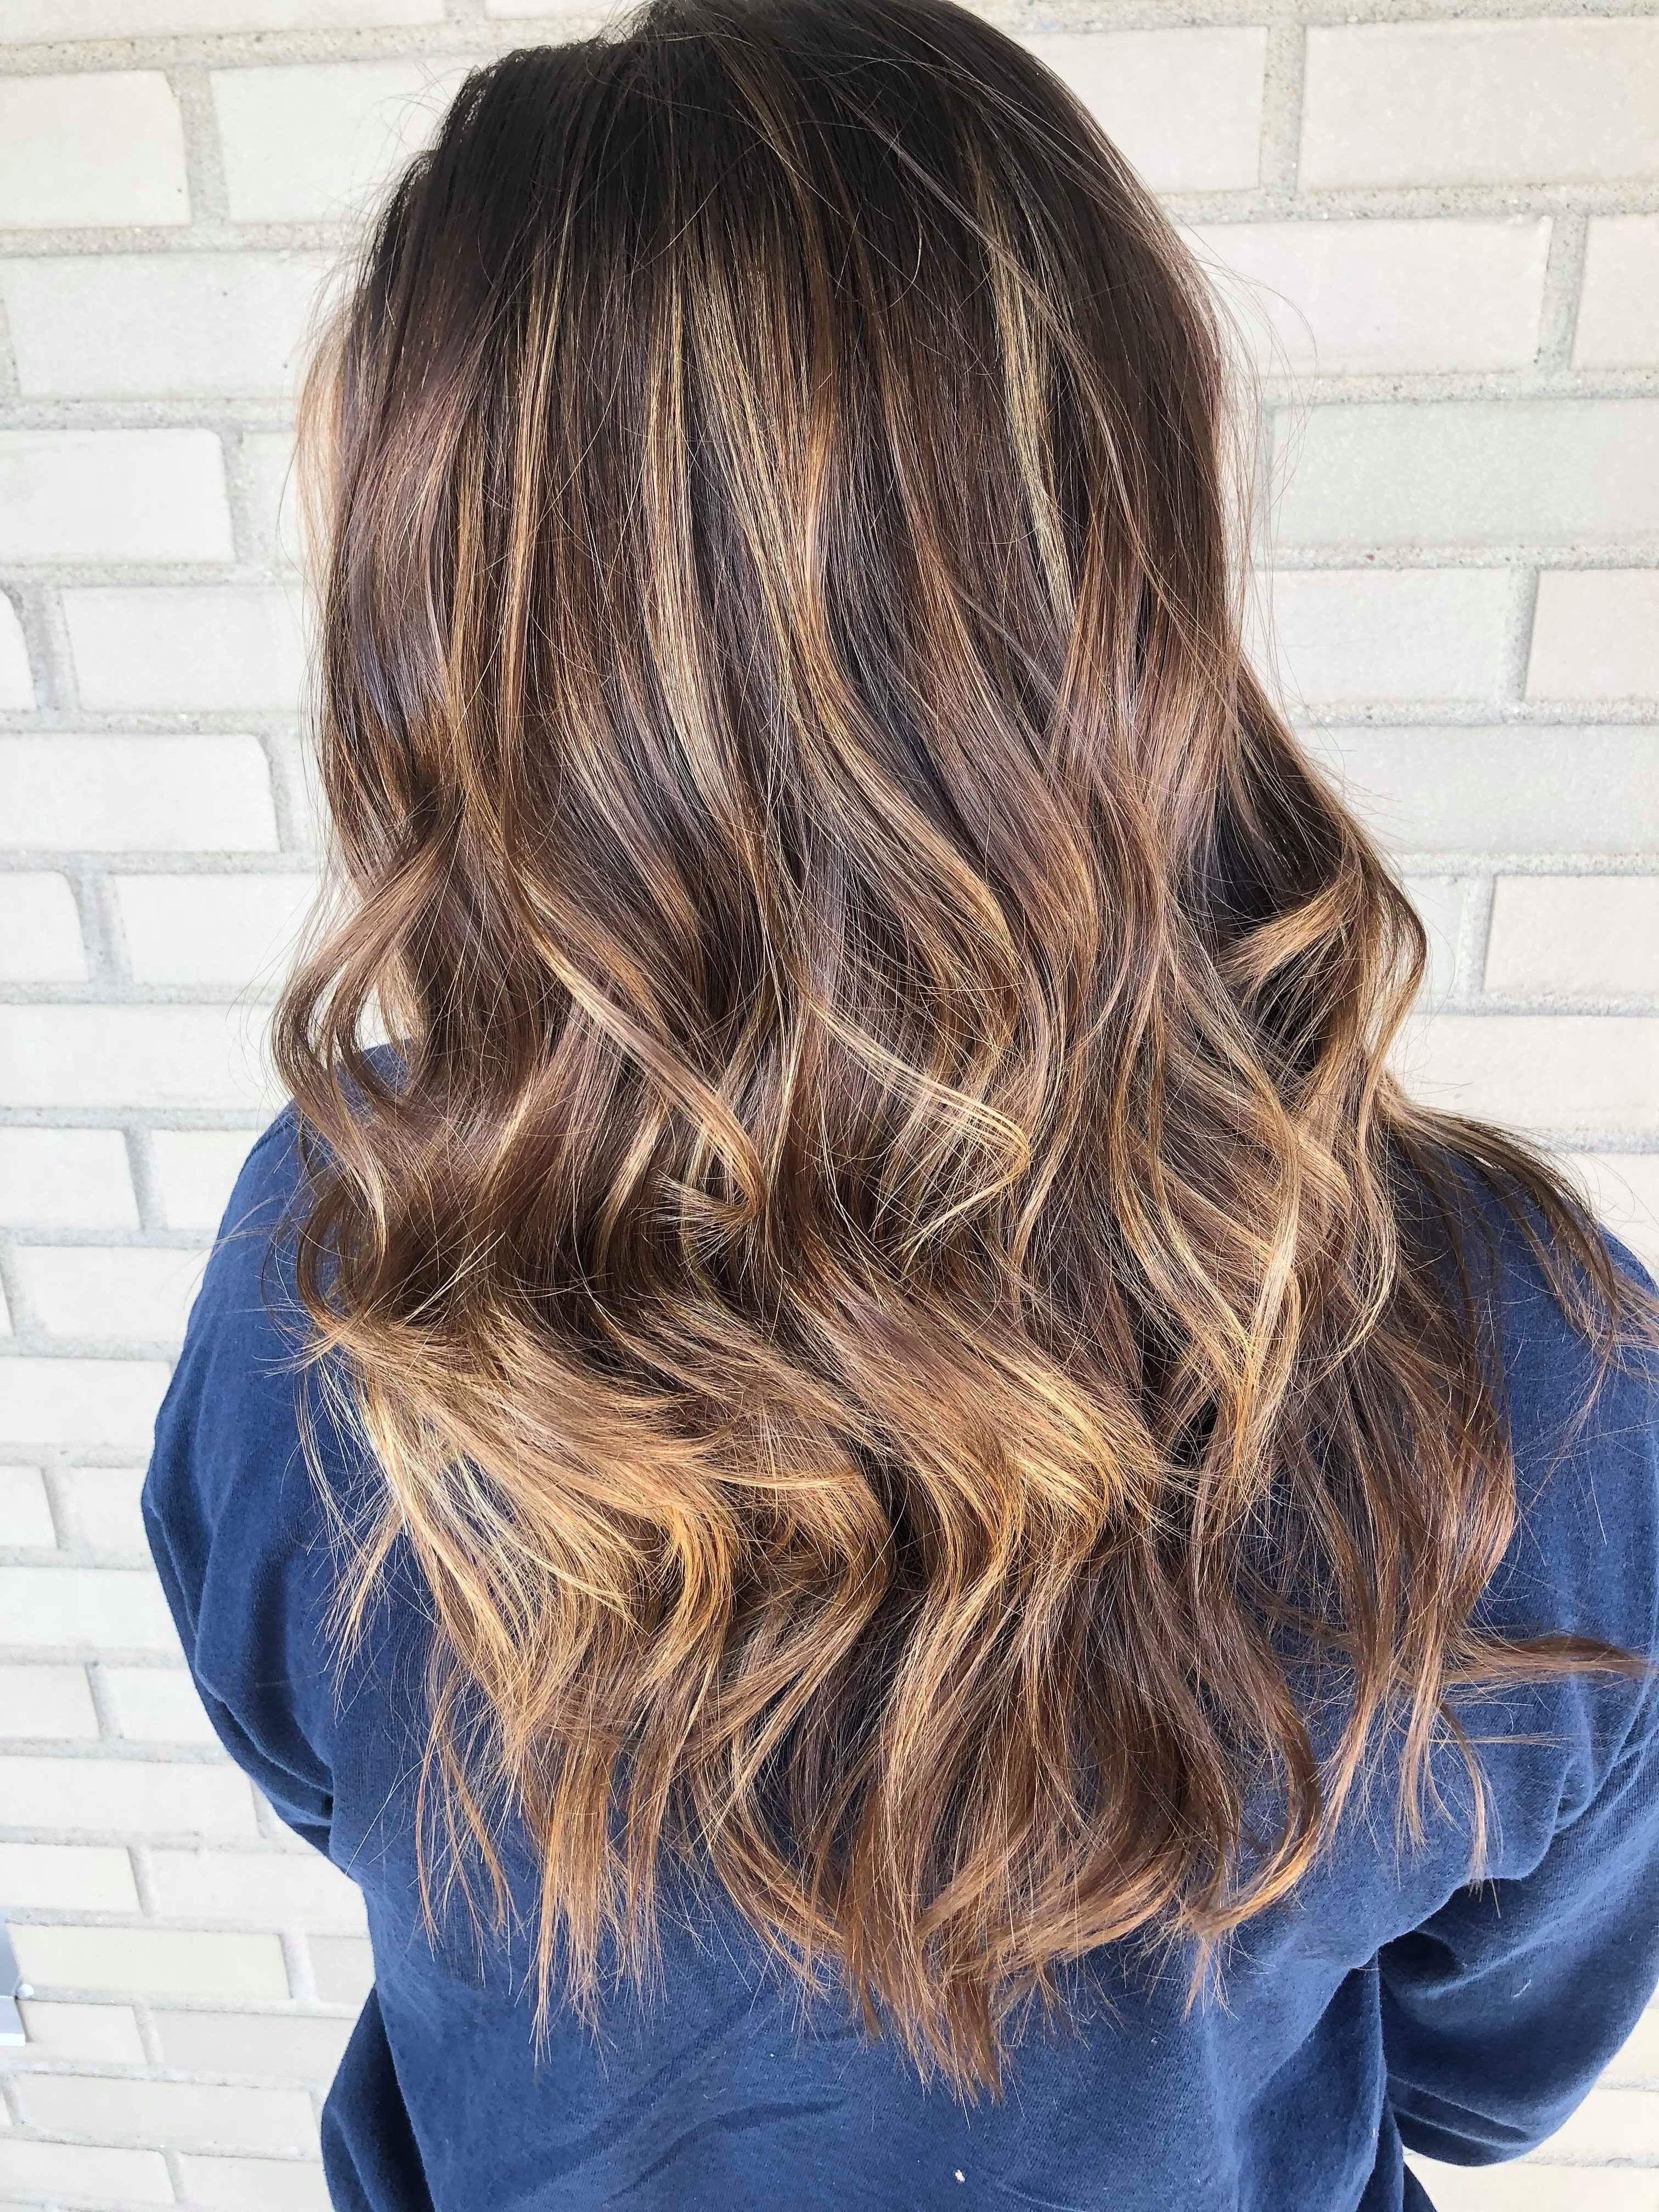 balayage #hilights #cute #hair #fall #winter #summer